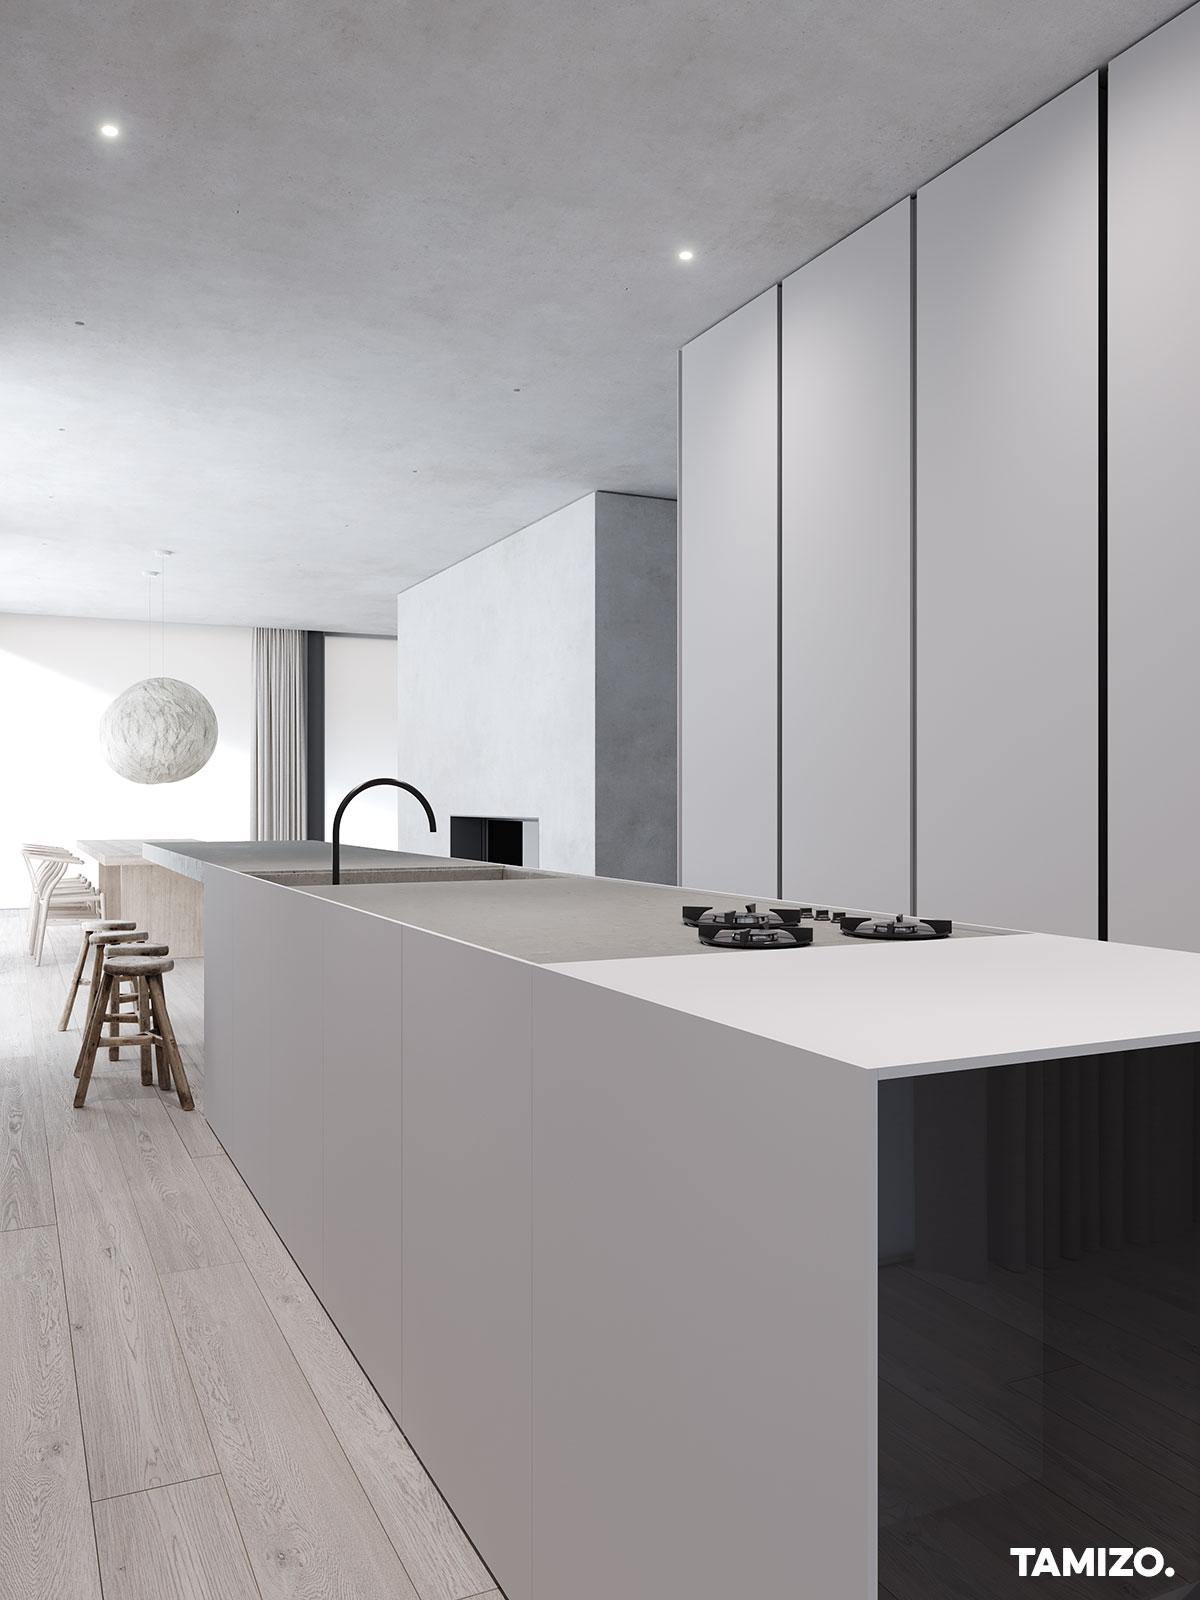 tamizo_architects_mateusz_kuo_stolarski_warszawa_iterior_design_house_minimal_02